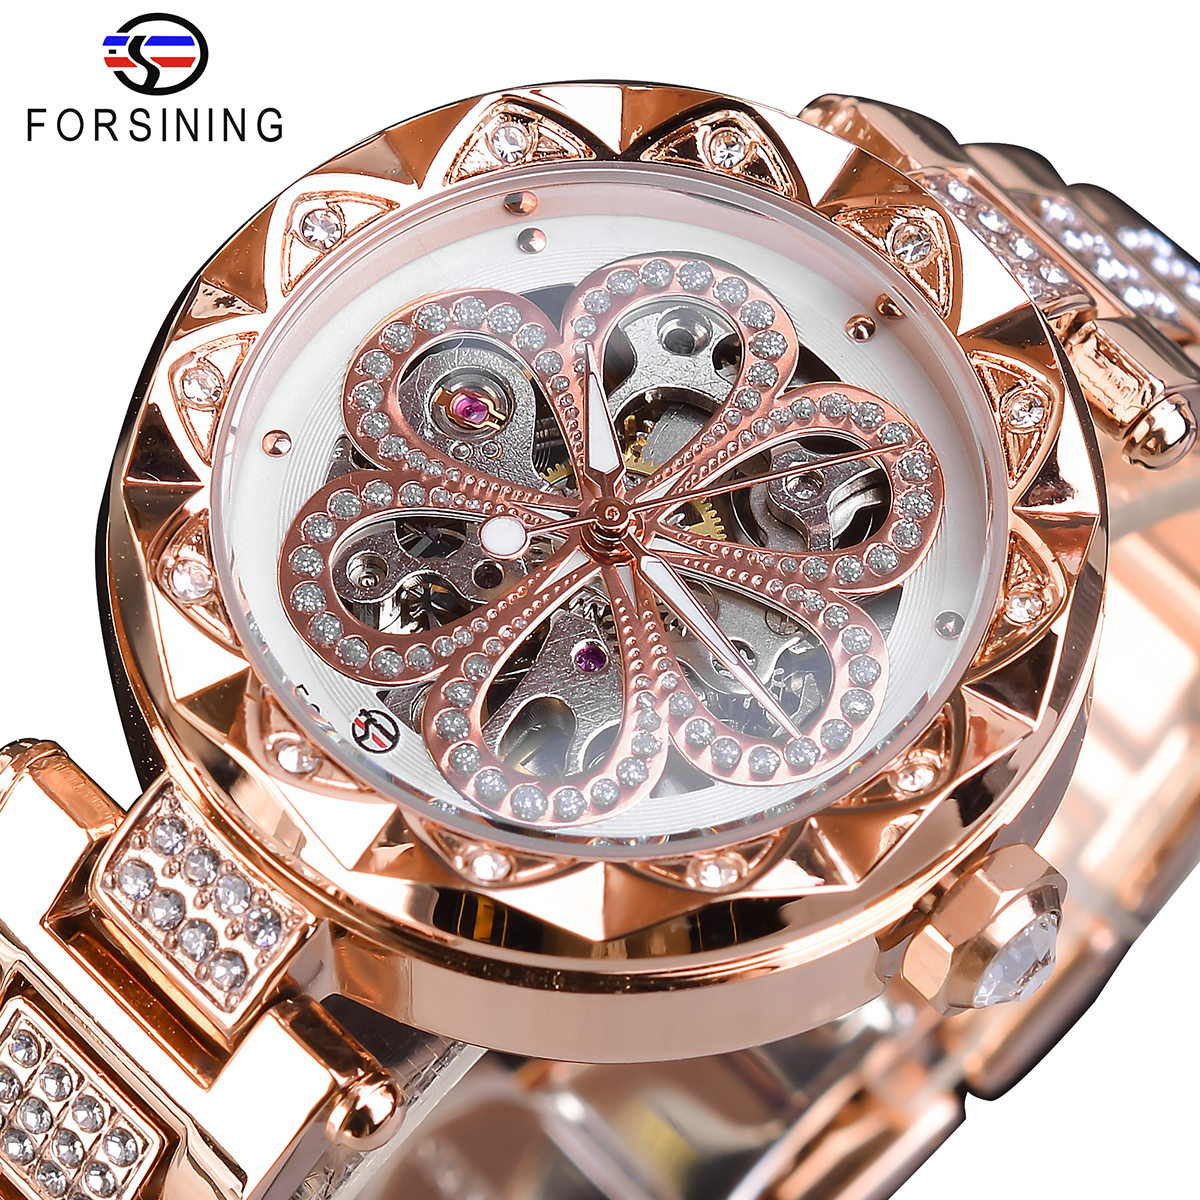 Forsining Fashion Women Watch Top Brand Diamond Female Wristwatch Automatic Machanical Watches Waterproof Luminous Hands Clock